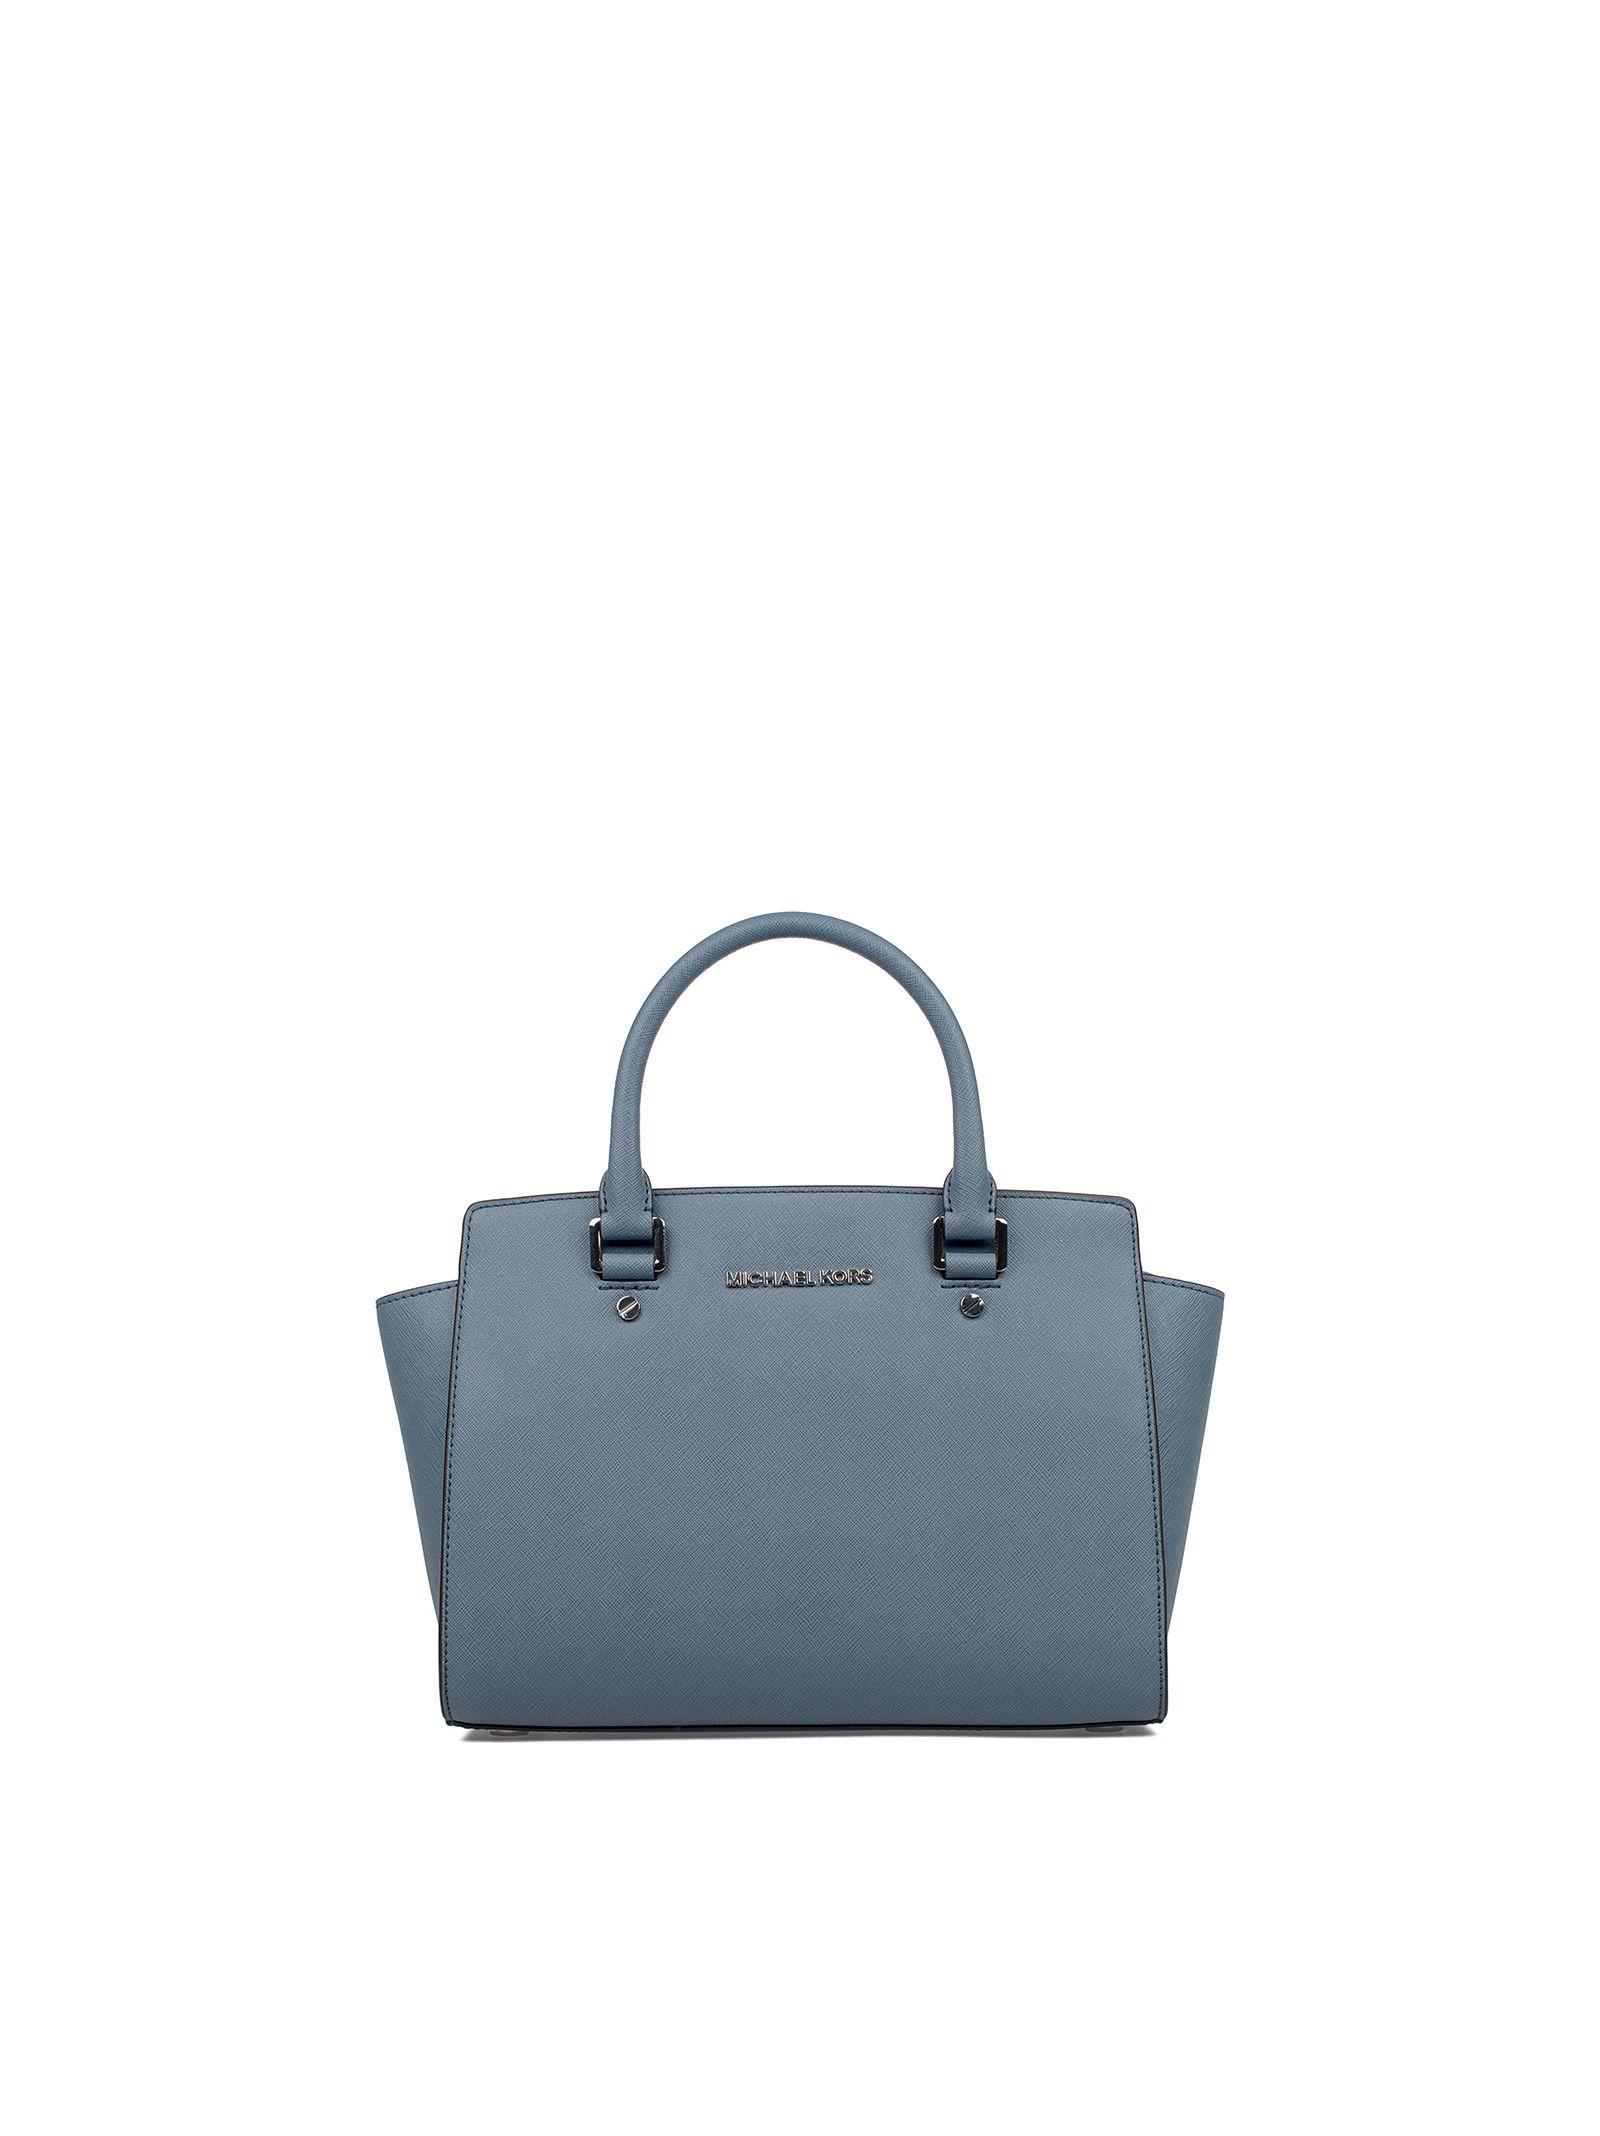 michael kors female denim medium selma seatchel saffiano leather top handle bag